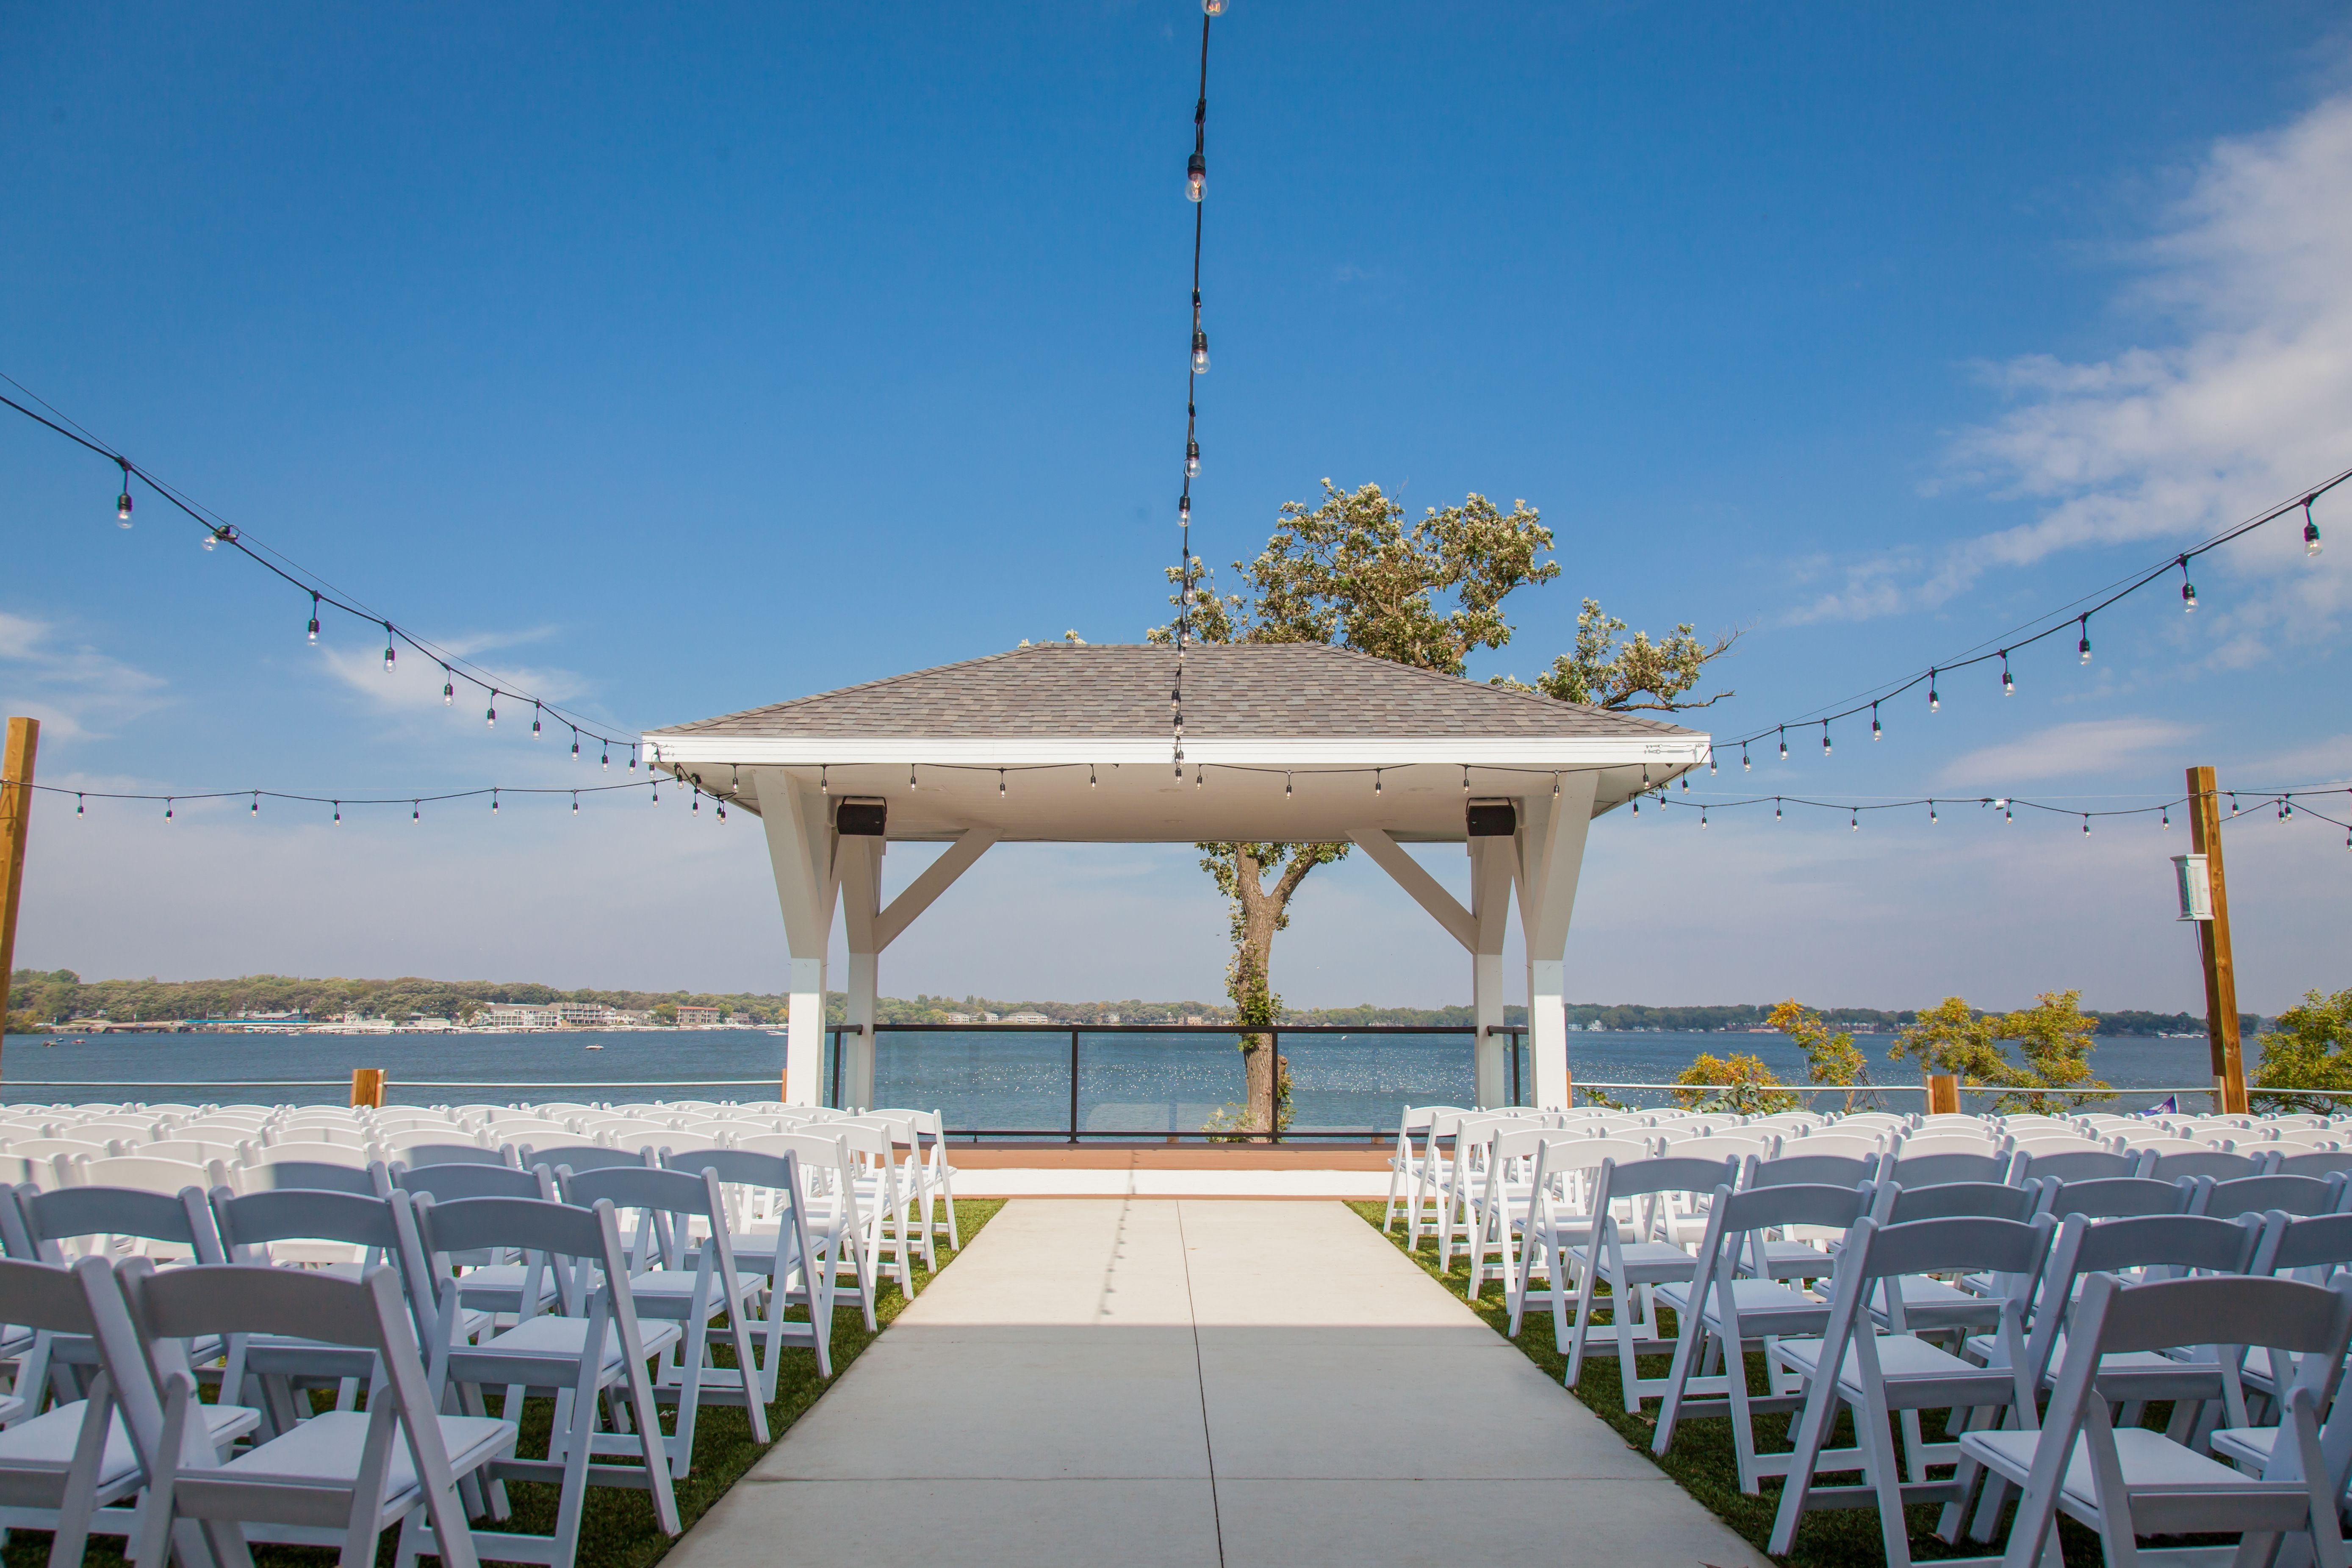 Waterfront Gazebo Overlooking Beautiful East Lake Okoboji Lakeside Wedding Venues: Okoboji Iowa Wedding Venues At Reisefeber.org